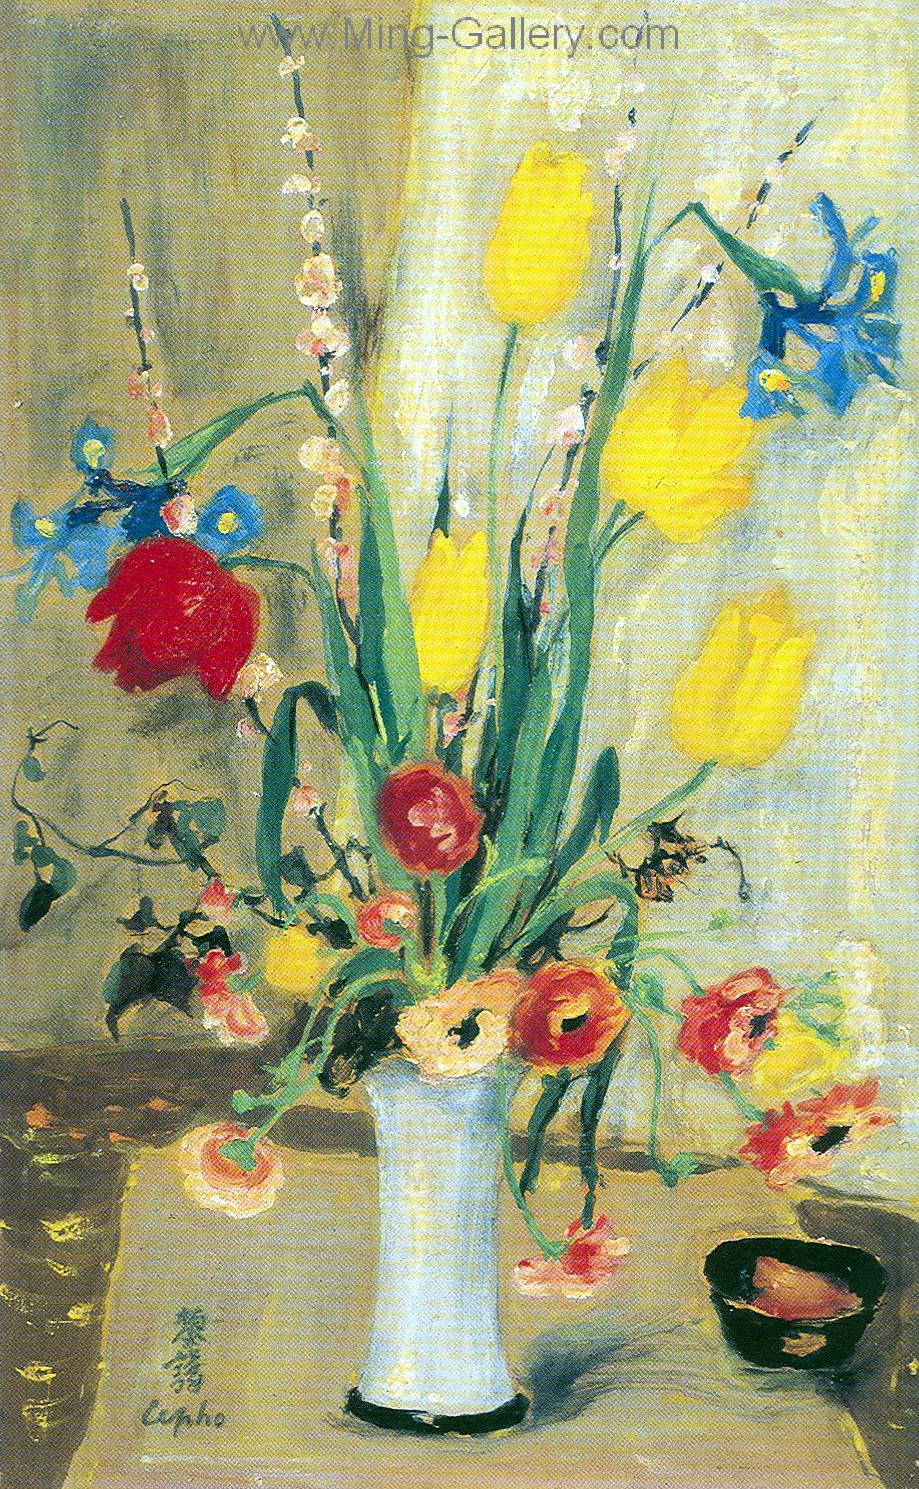 Vnl0016 Le Pho Vietnamese Art Painting Art Impressionist Paintings